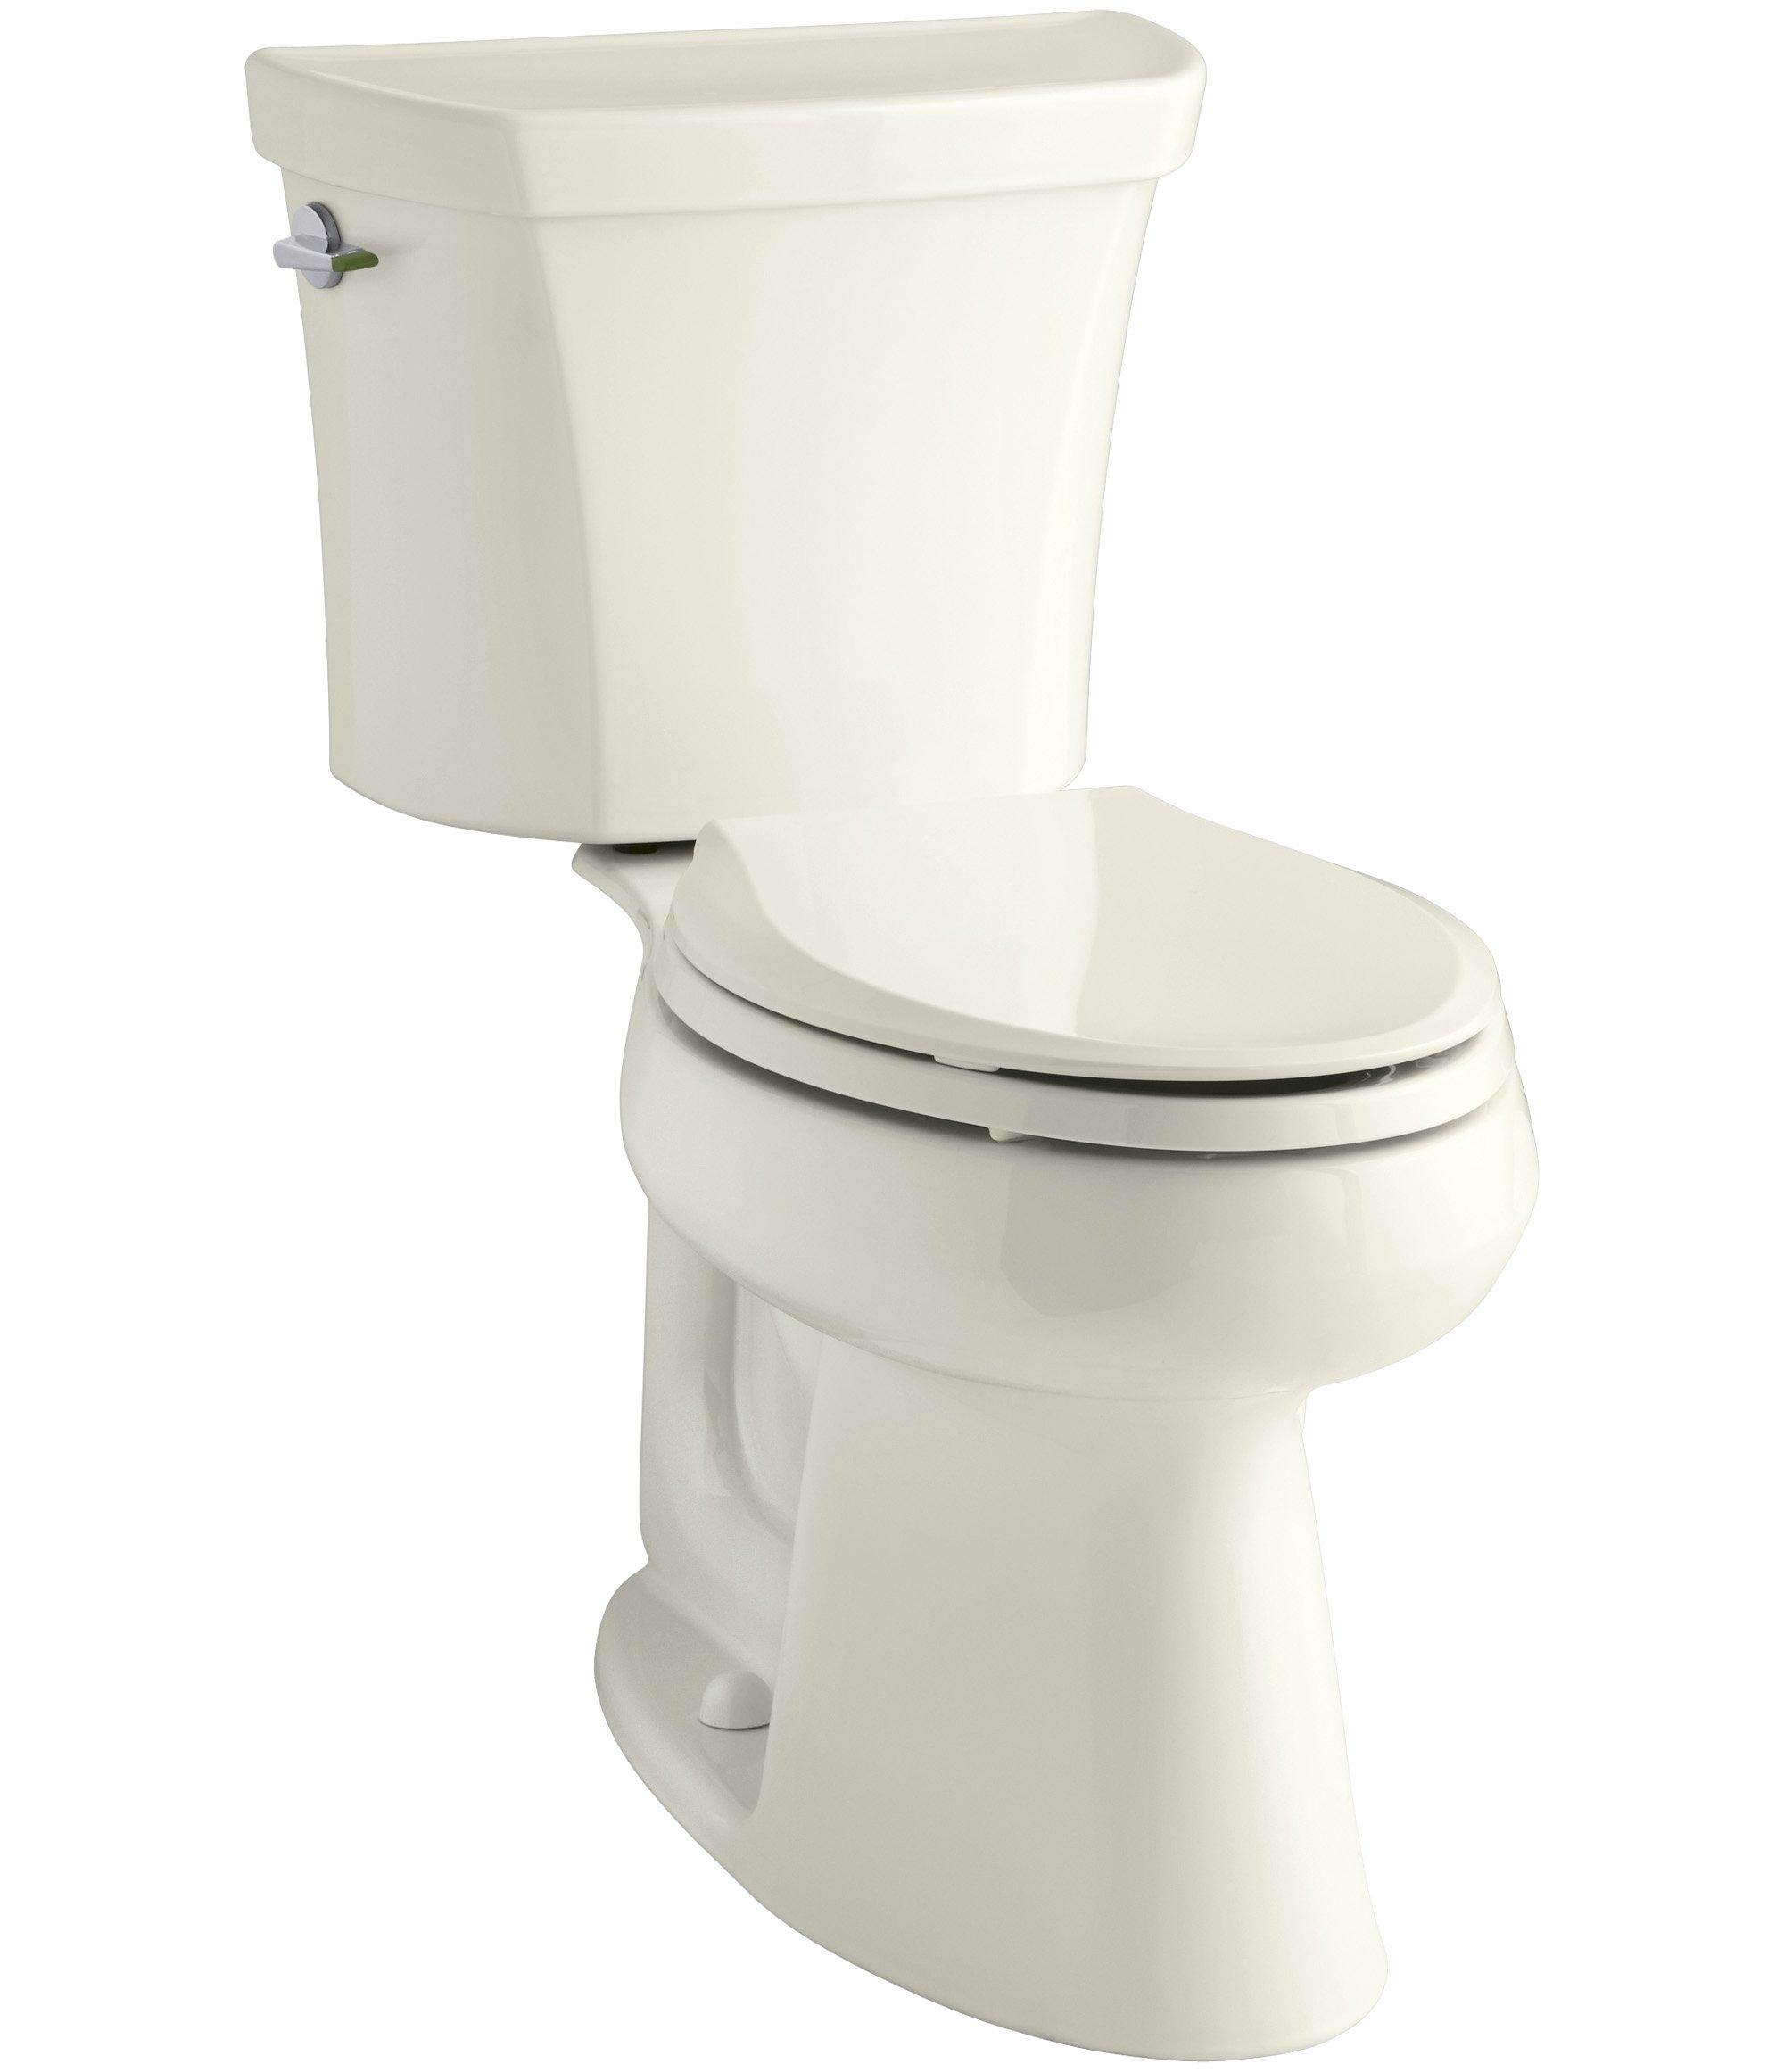 K 3989 96 Wellworth Two Piece Dual Flush Elongated